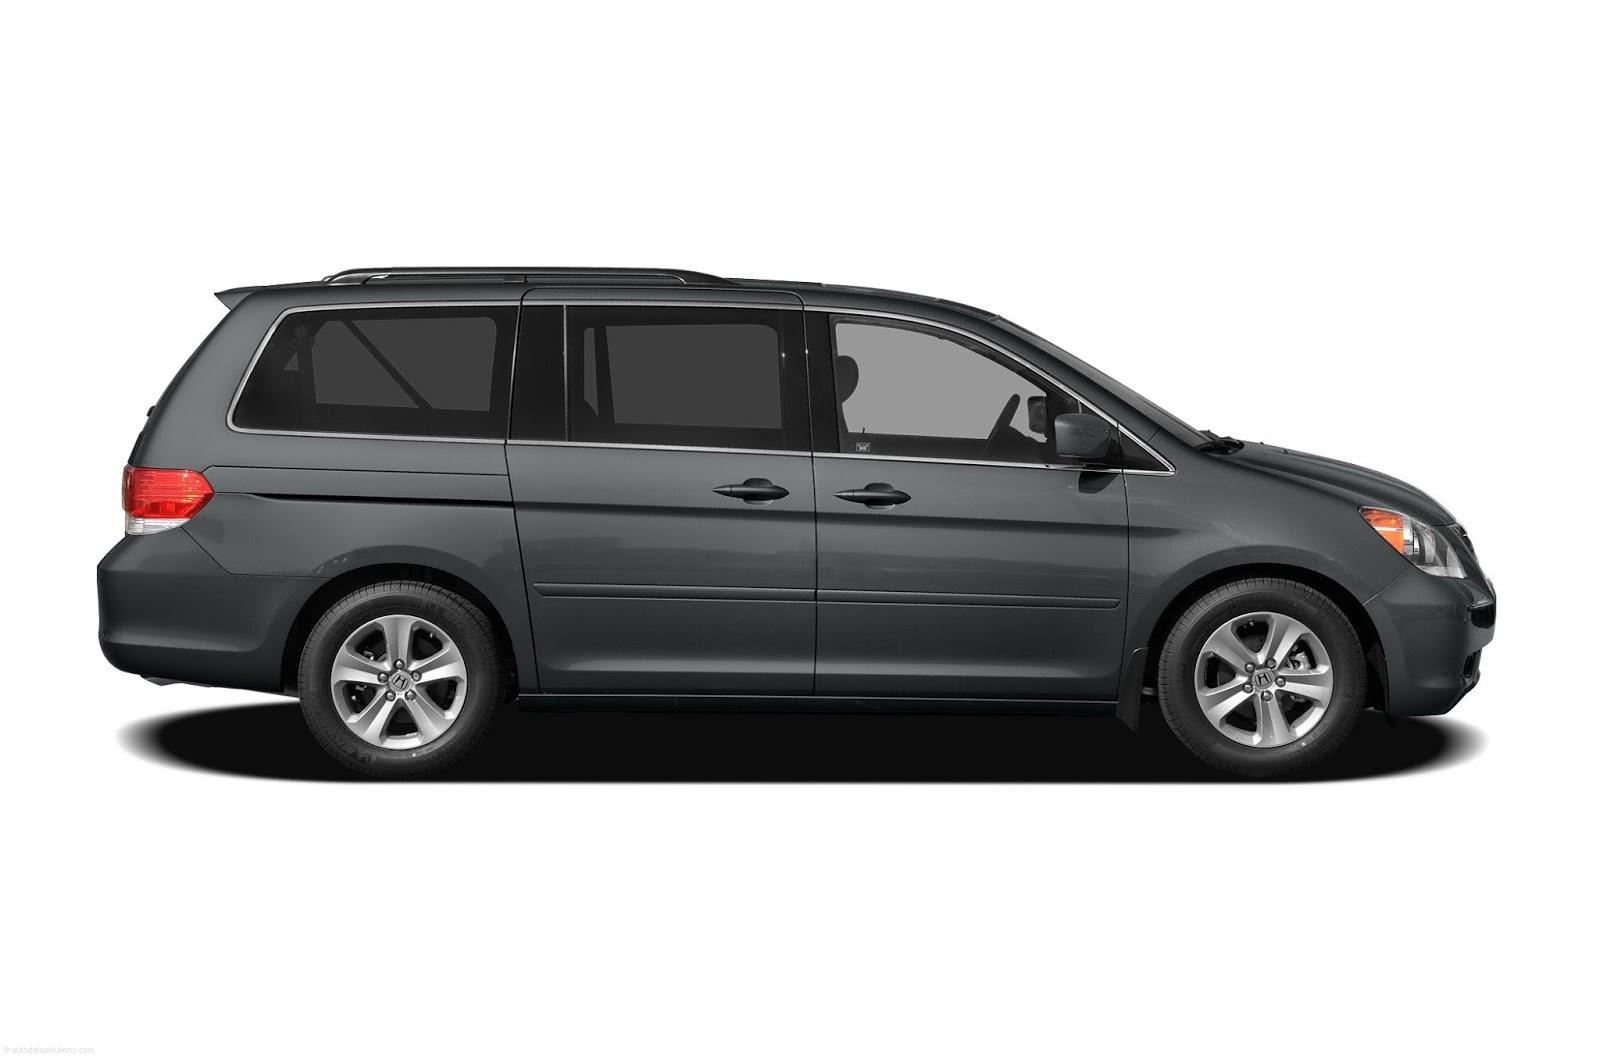 honda odyssey lx minivan images car hd wallpapers. Black Bedroom Furniture Sets. Home Design Ideas